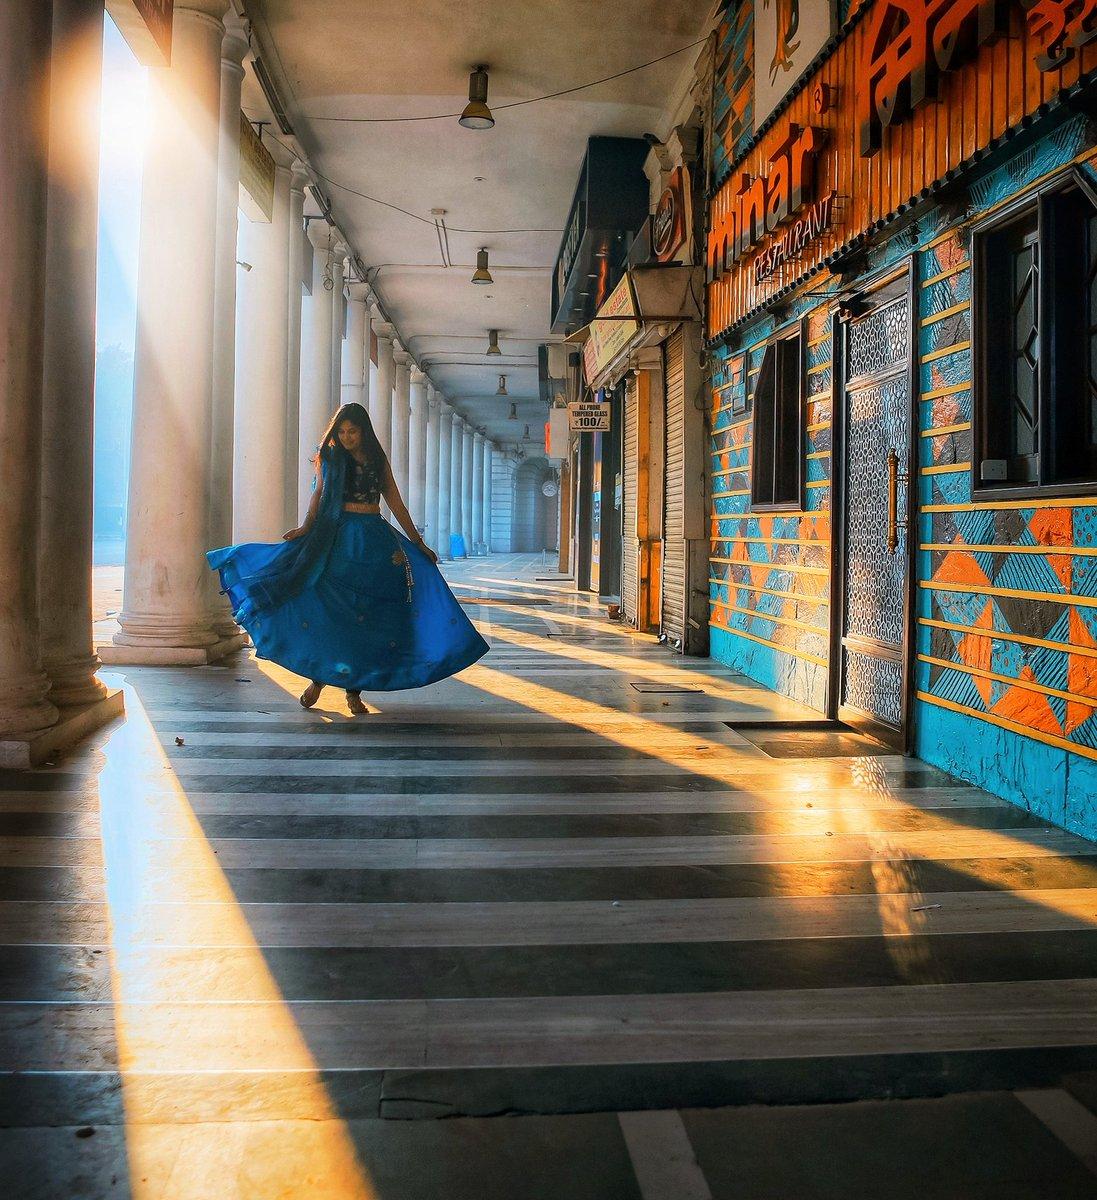 कभी मुझे लगे की जैसे सारा ही ये जहां है जादू...💞  @teekhi_mircheee @IndiaTourism_EU @tourism_delhi #wednesdaythought #WednesdayMotivation